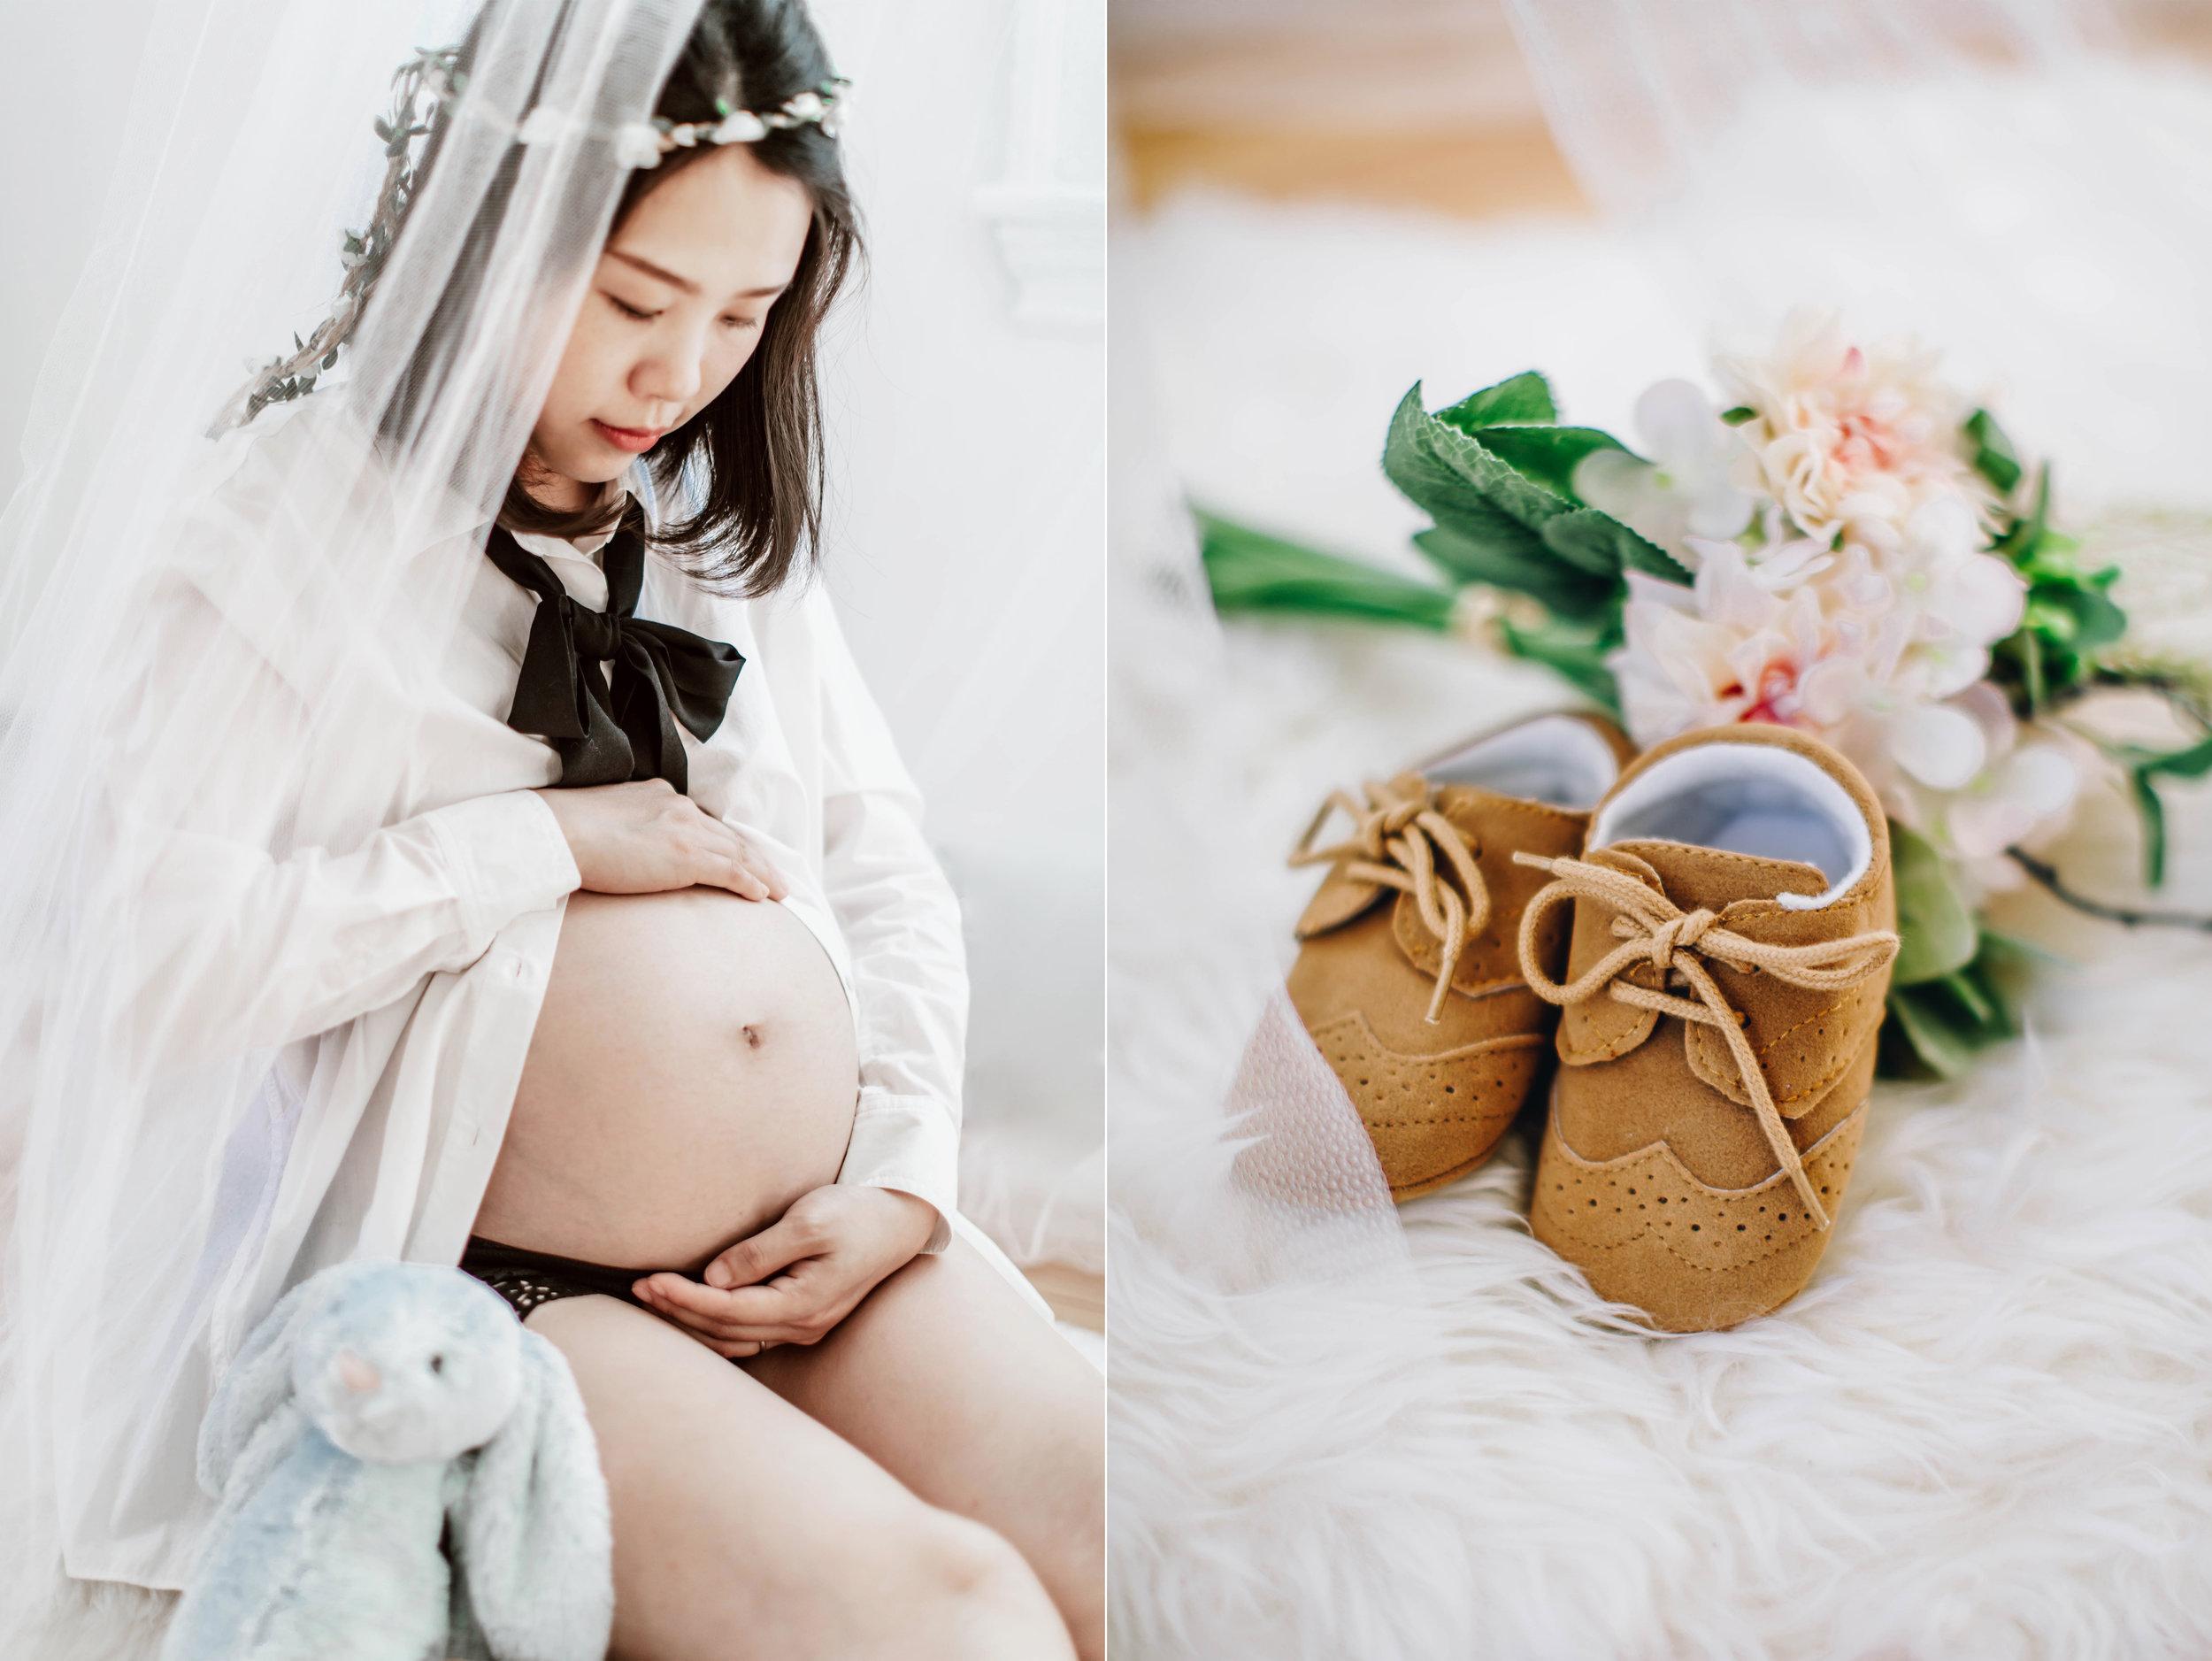 a-sweet-summer-maternity-eva-loh-02.jpg